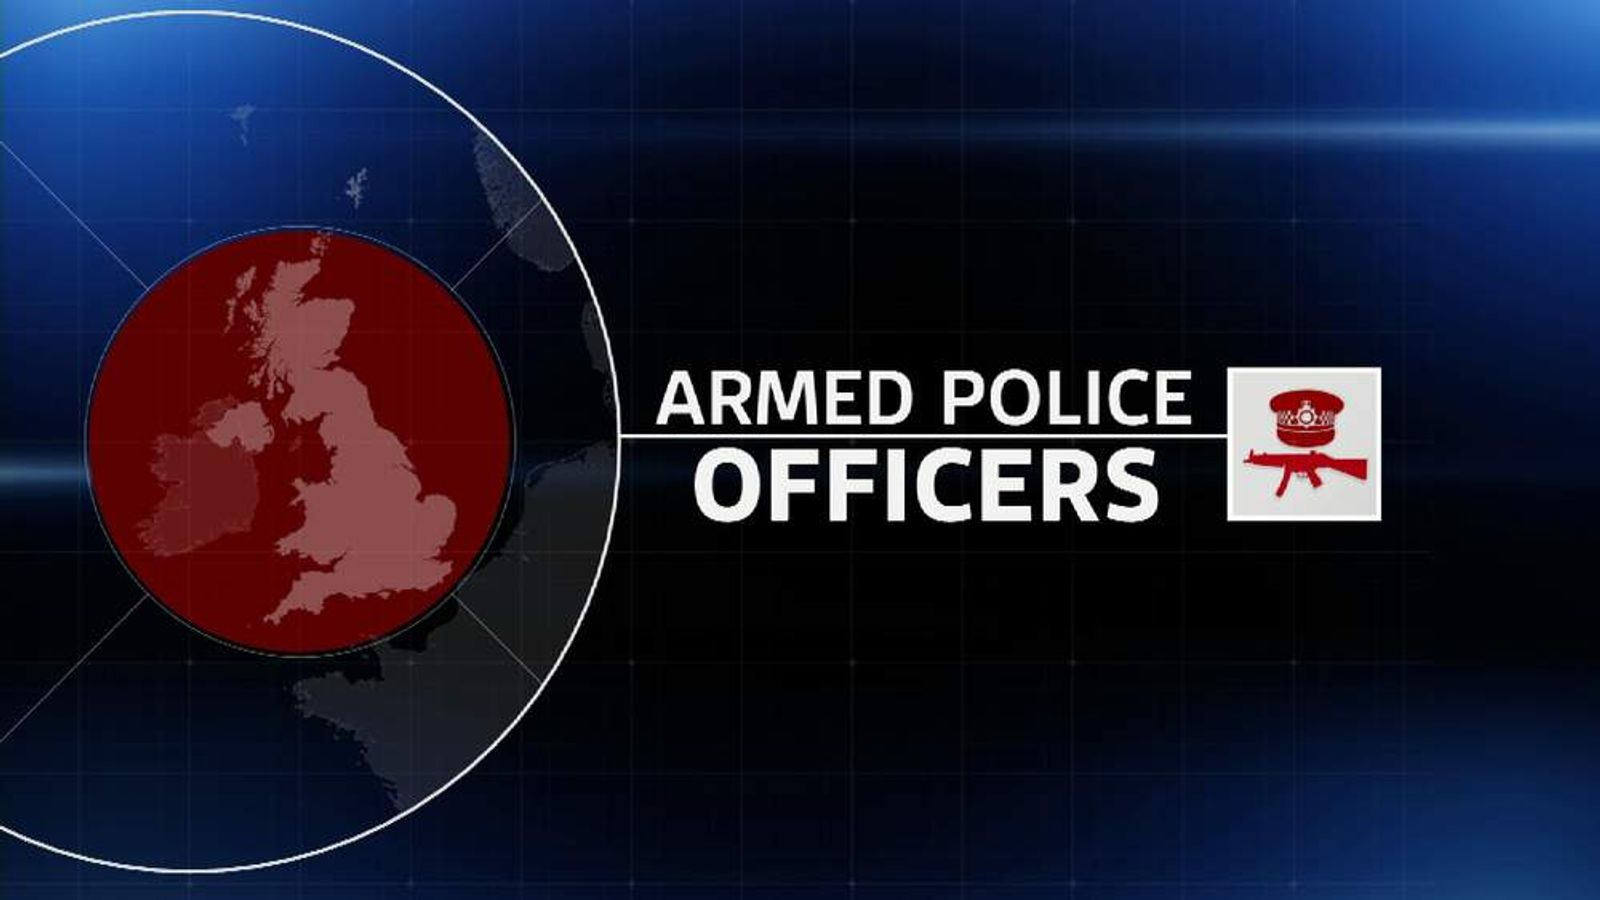 UK Terror Police Divisions